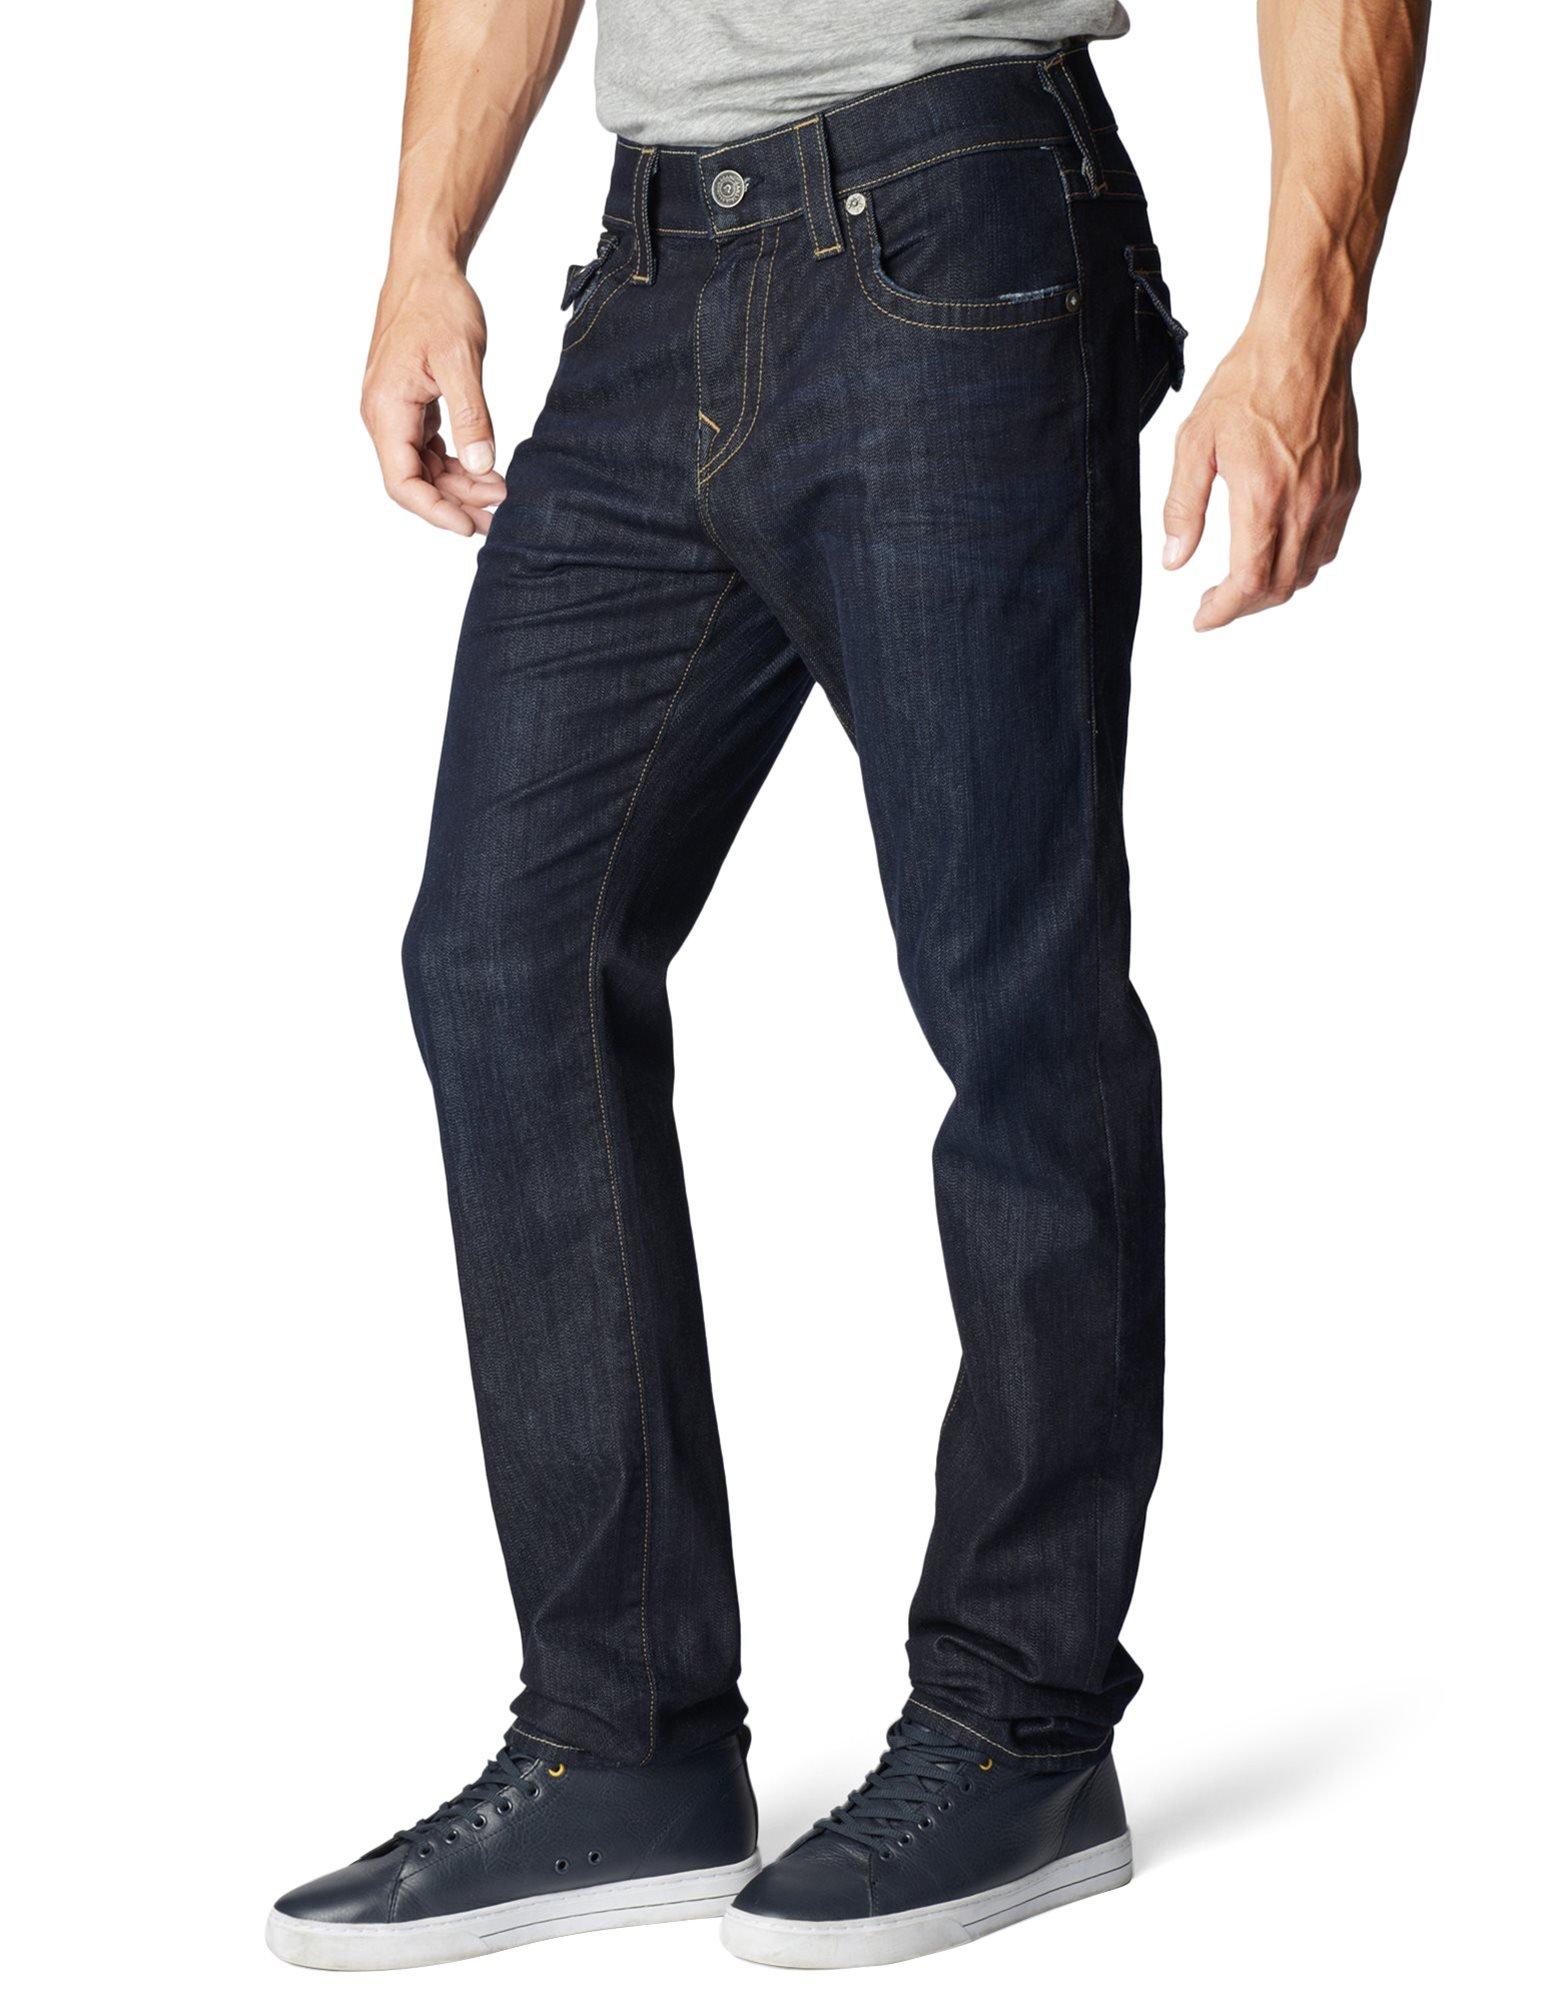 True Religion Men's Geno W Flap Slim Jean, Wanted Man, 40